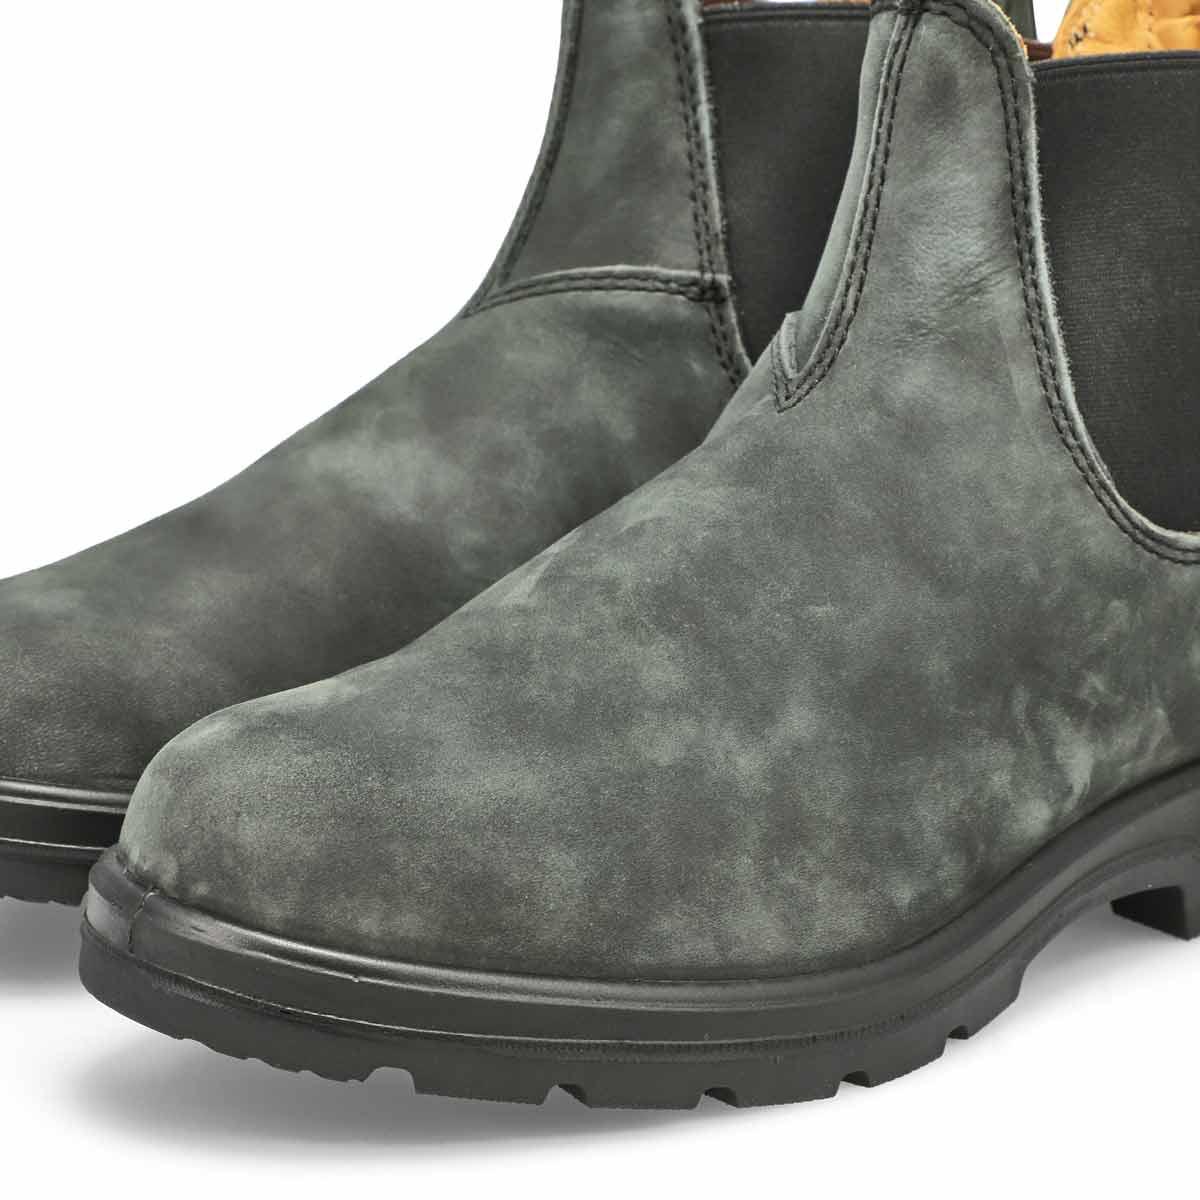 Unisex  1478 The Winter Boot - Rustic Black